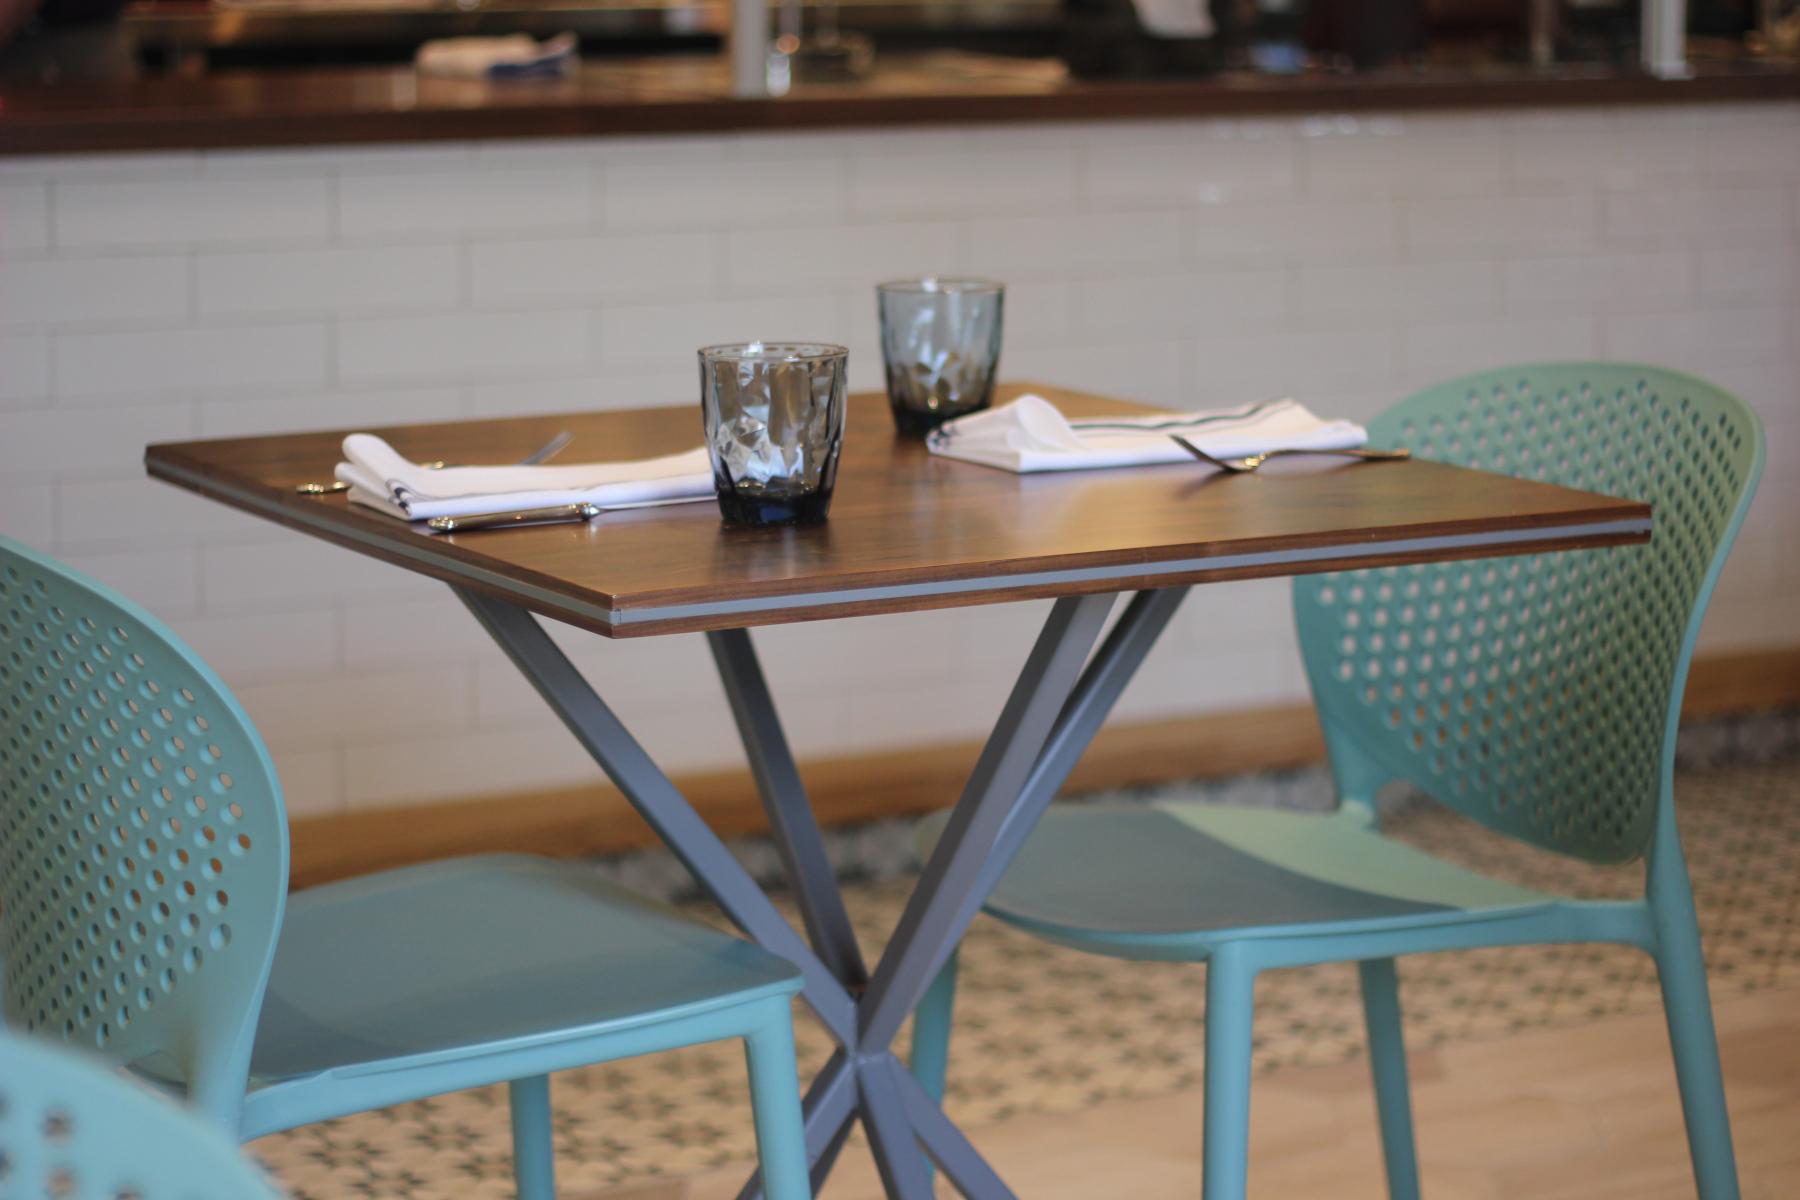 saddle-river-cafe-table.jpg